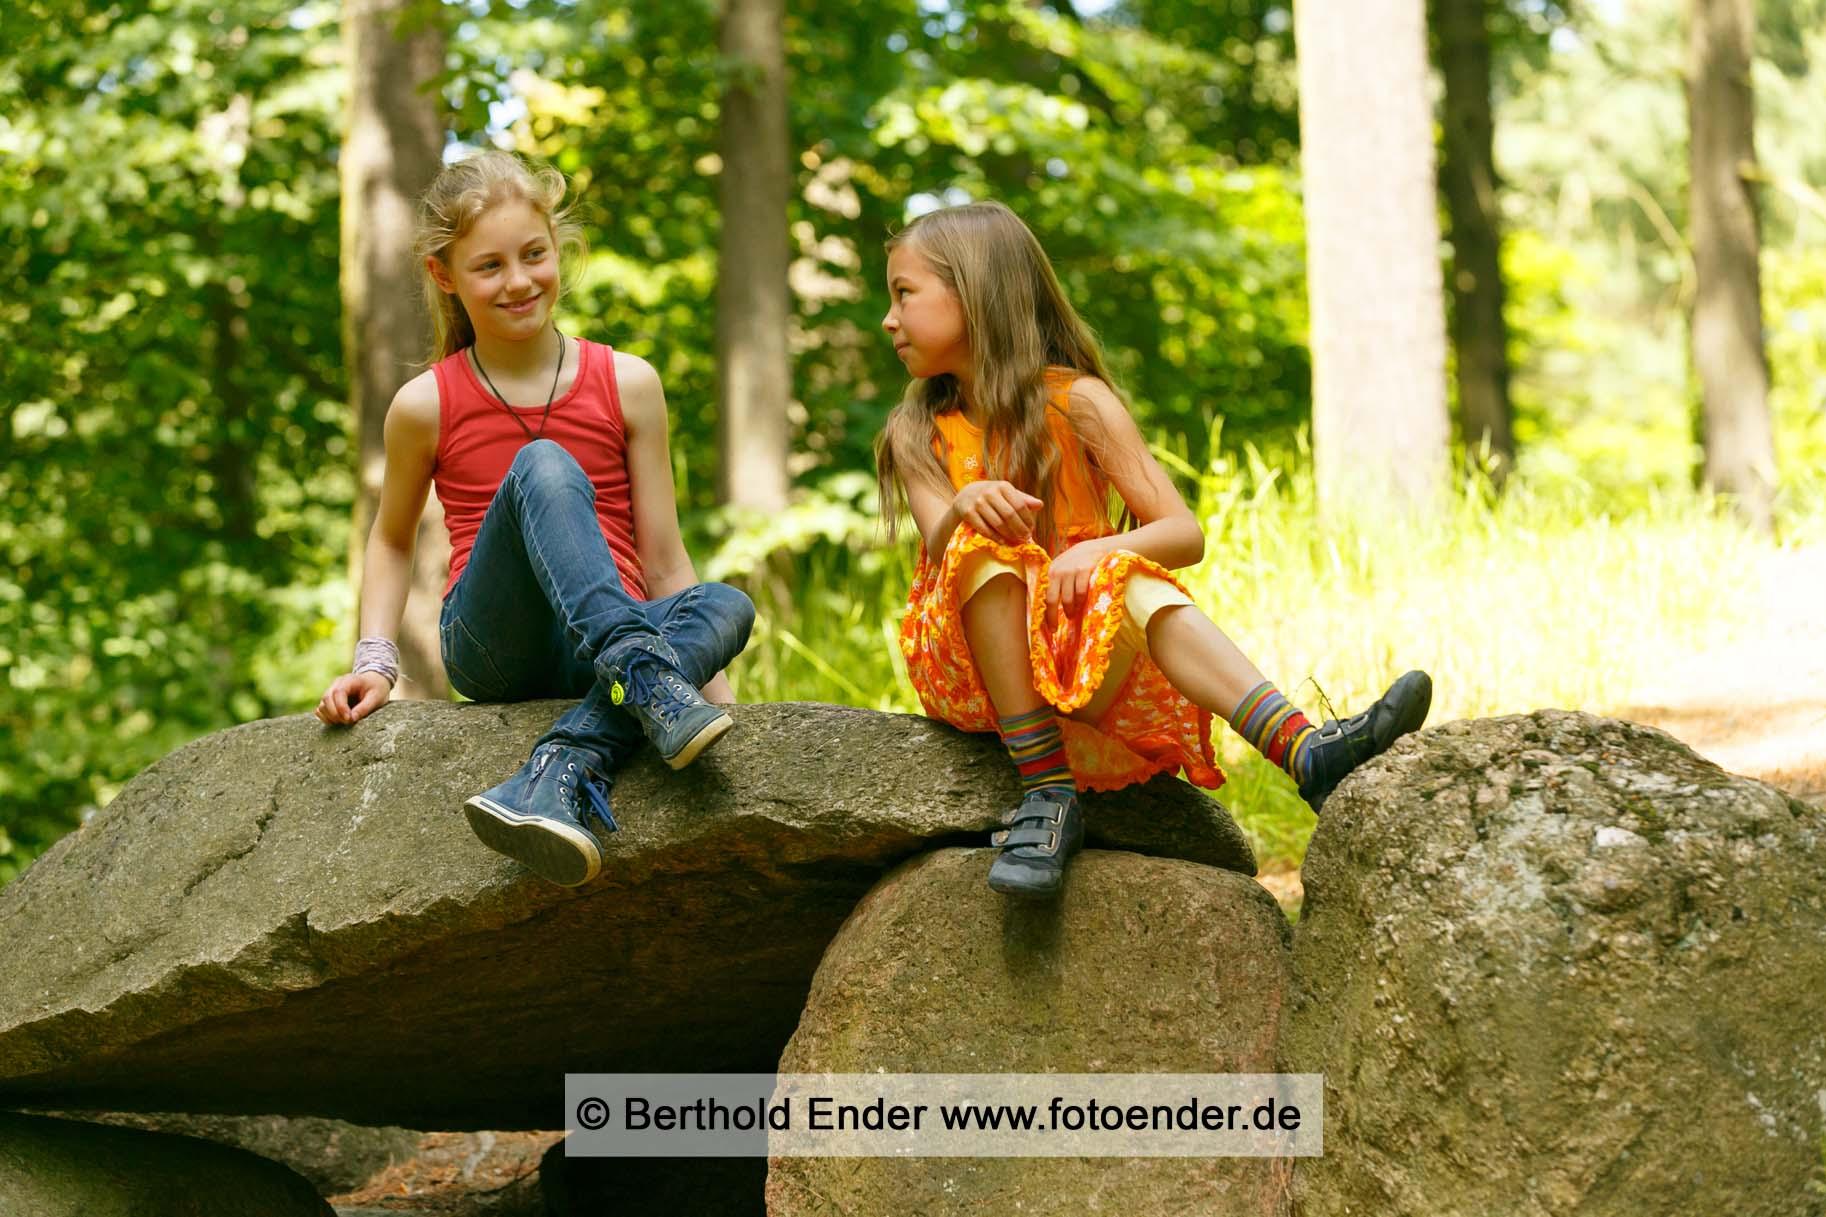 Fotoshooting on location im Park Oranienbaum - Fotostudio Ender